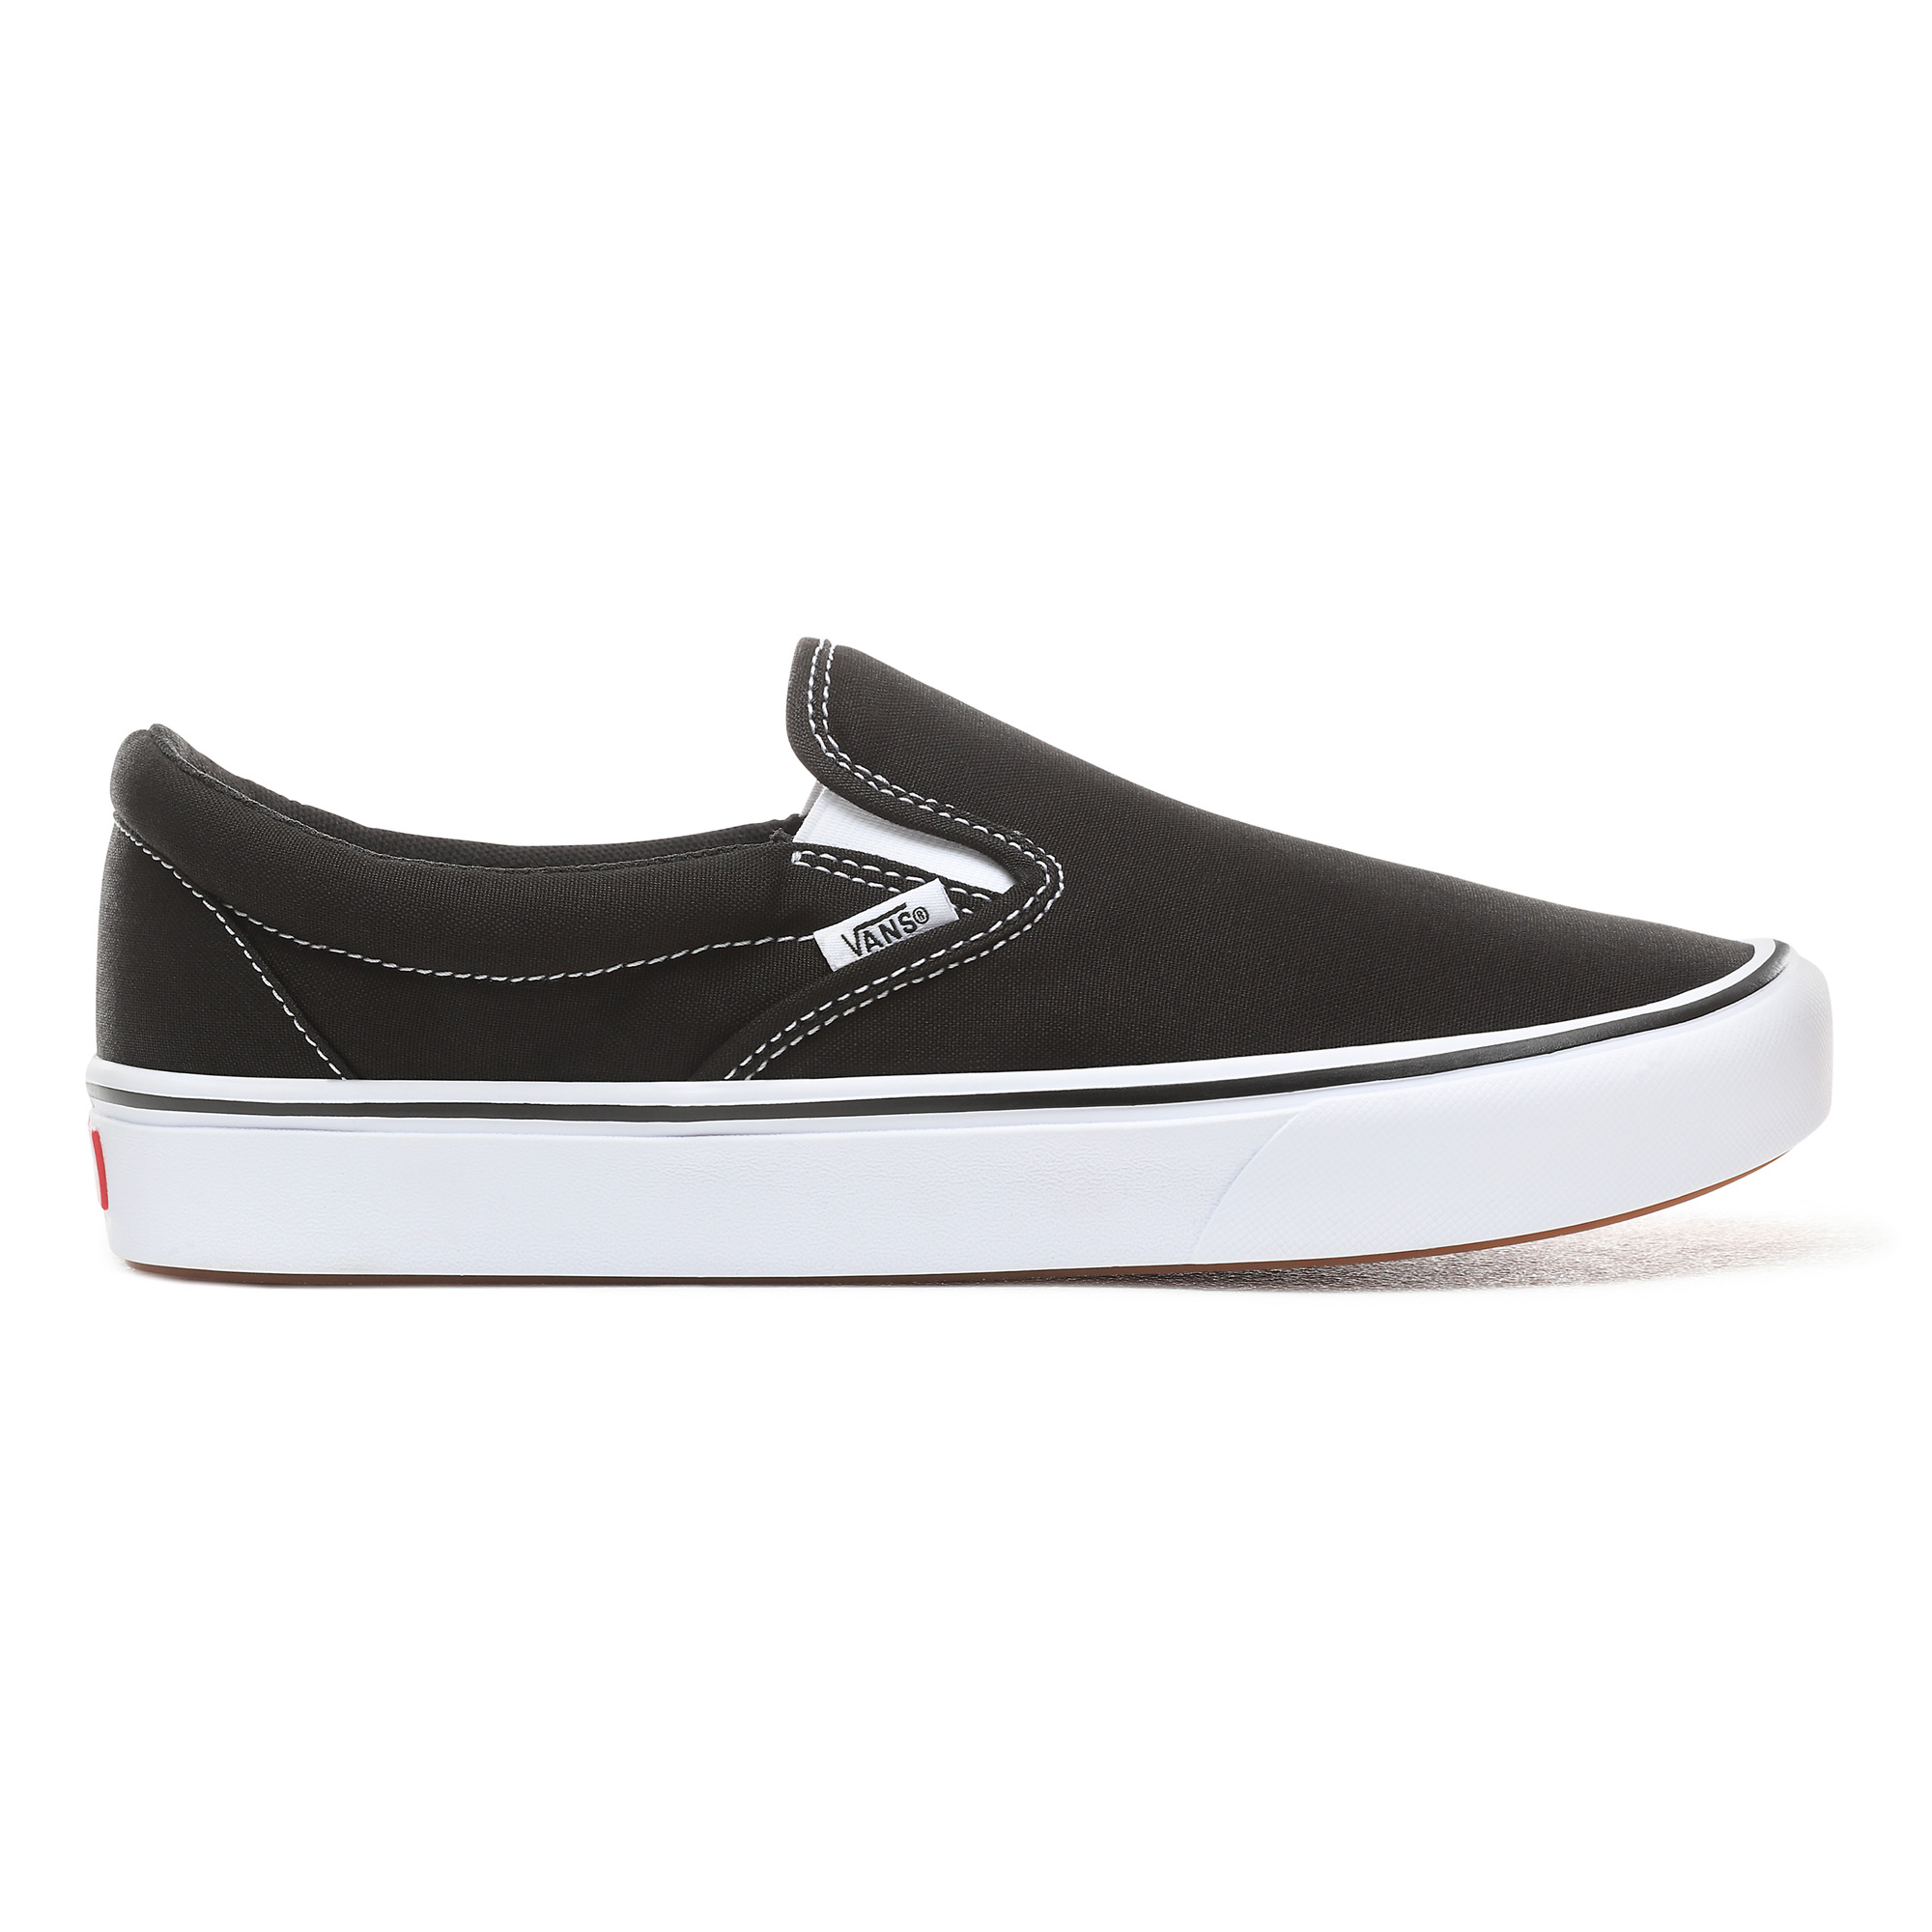 Vans Classic ComfyCush Slip-On sneakers, unisex, black, 36,5